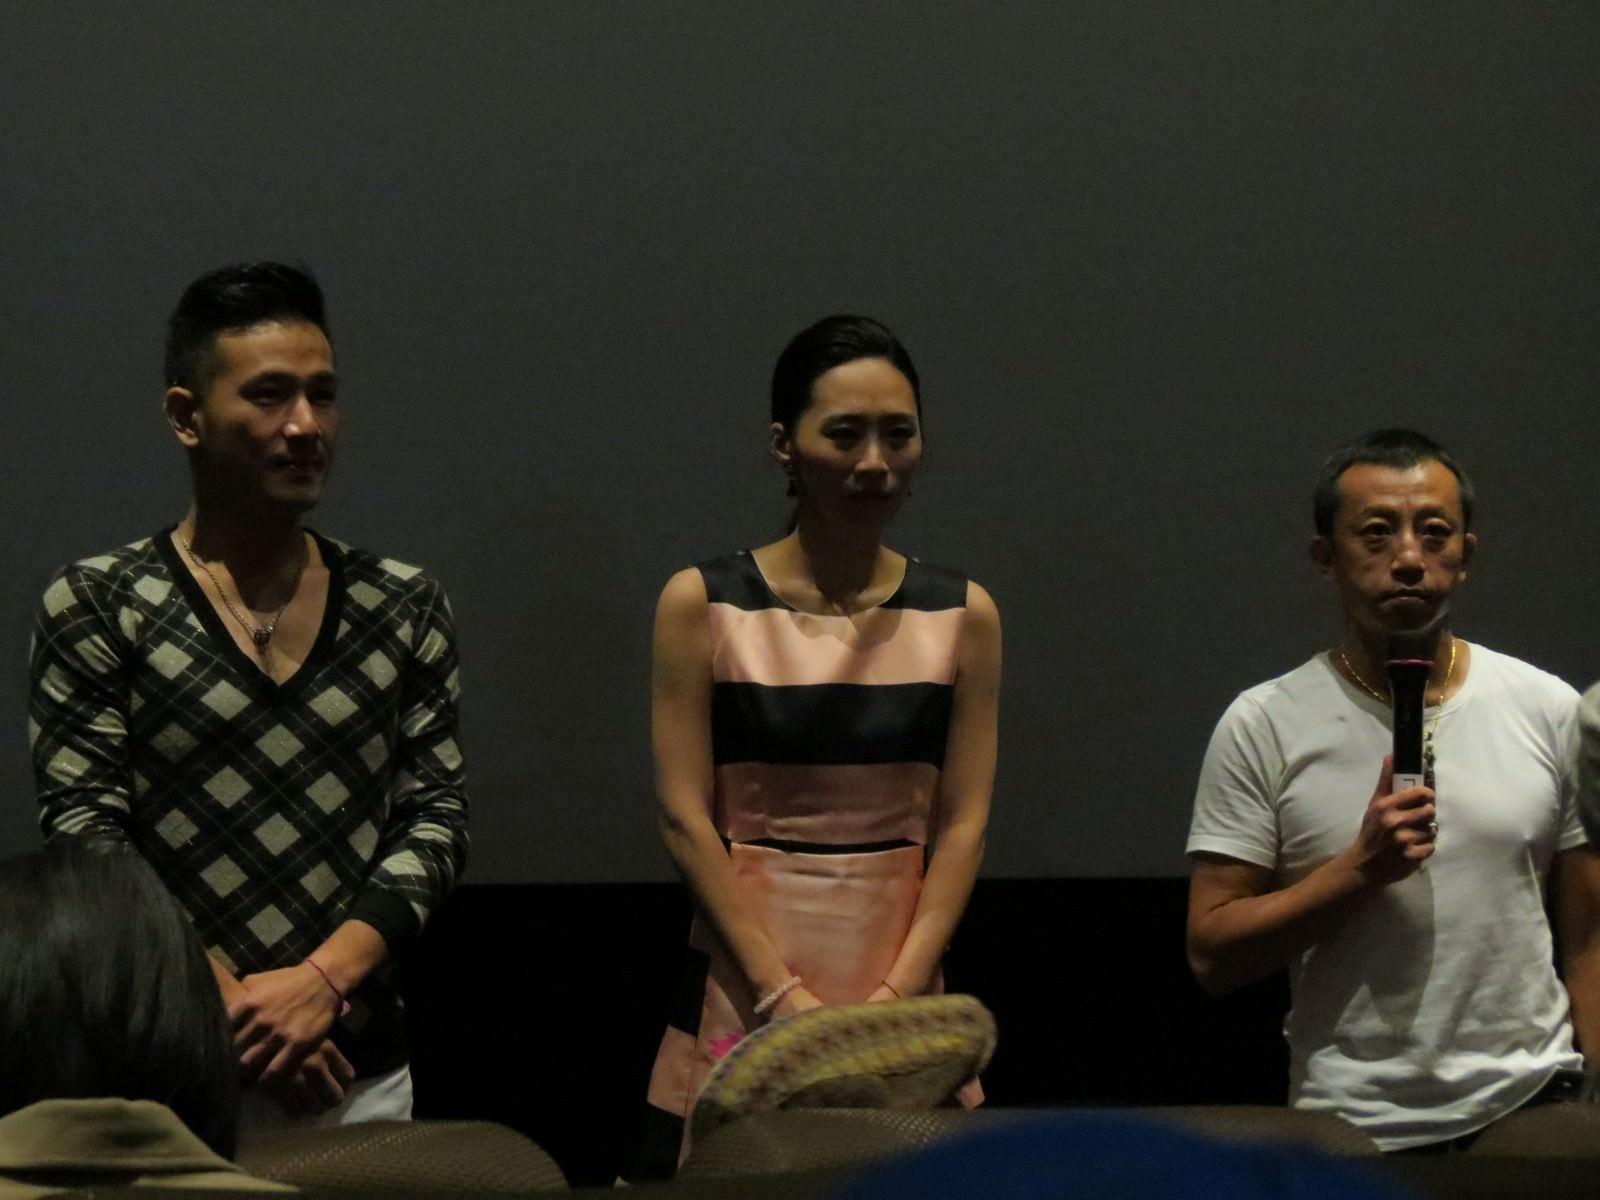 Movie, 血觀音(台灣, 2017年) / The Bold, The Corrupt, and the Beautiful(英文), 特映會映後座談, 導演與演員